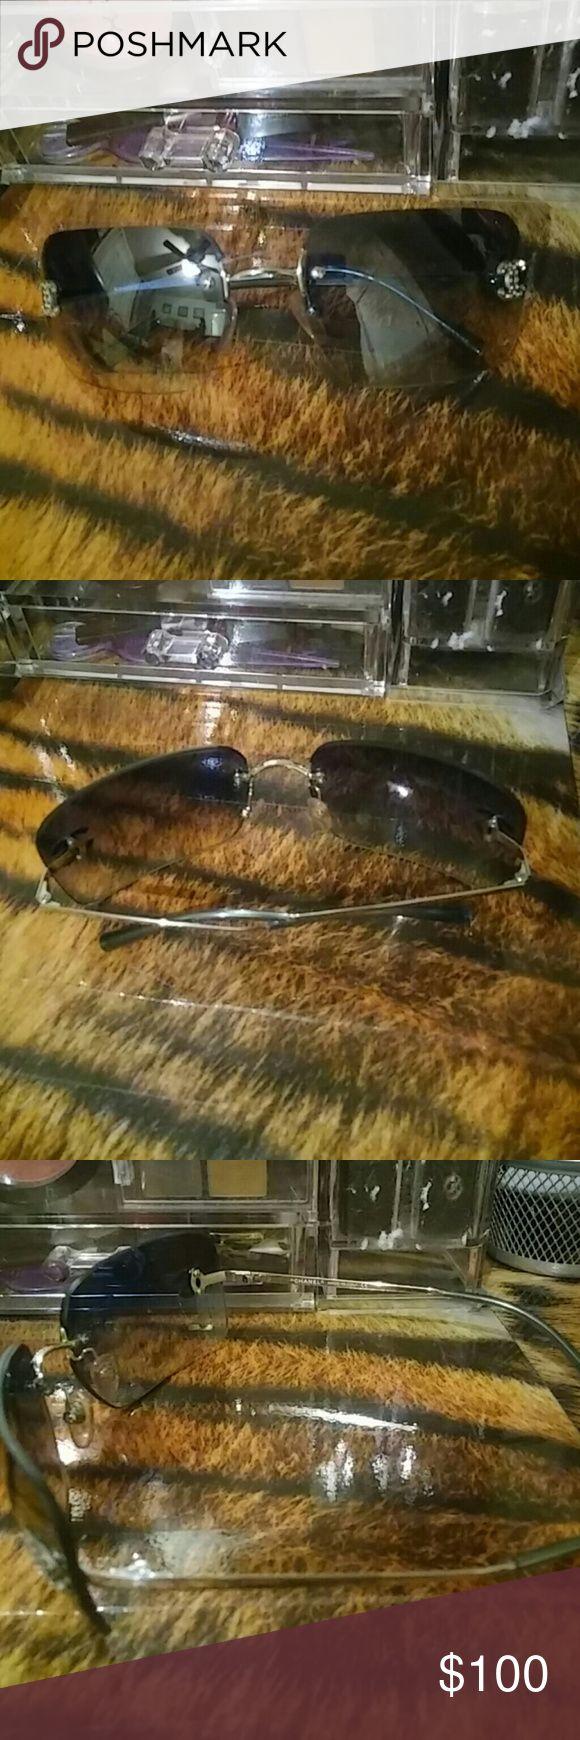 Last Sale Authentic chanel Sunglasses Excellent condition No case Other